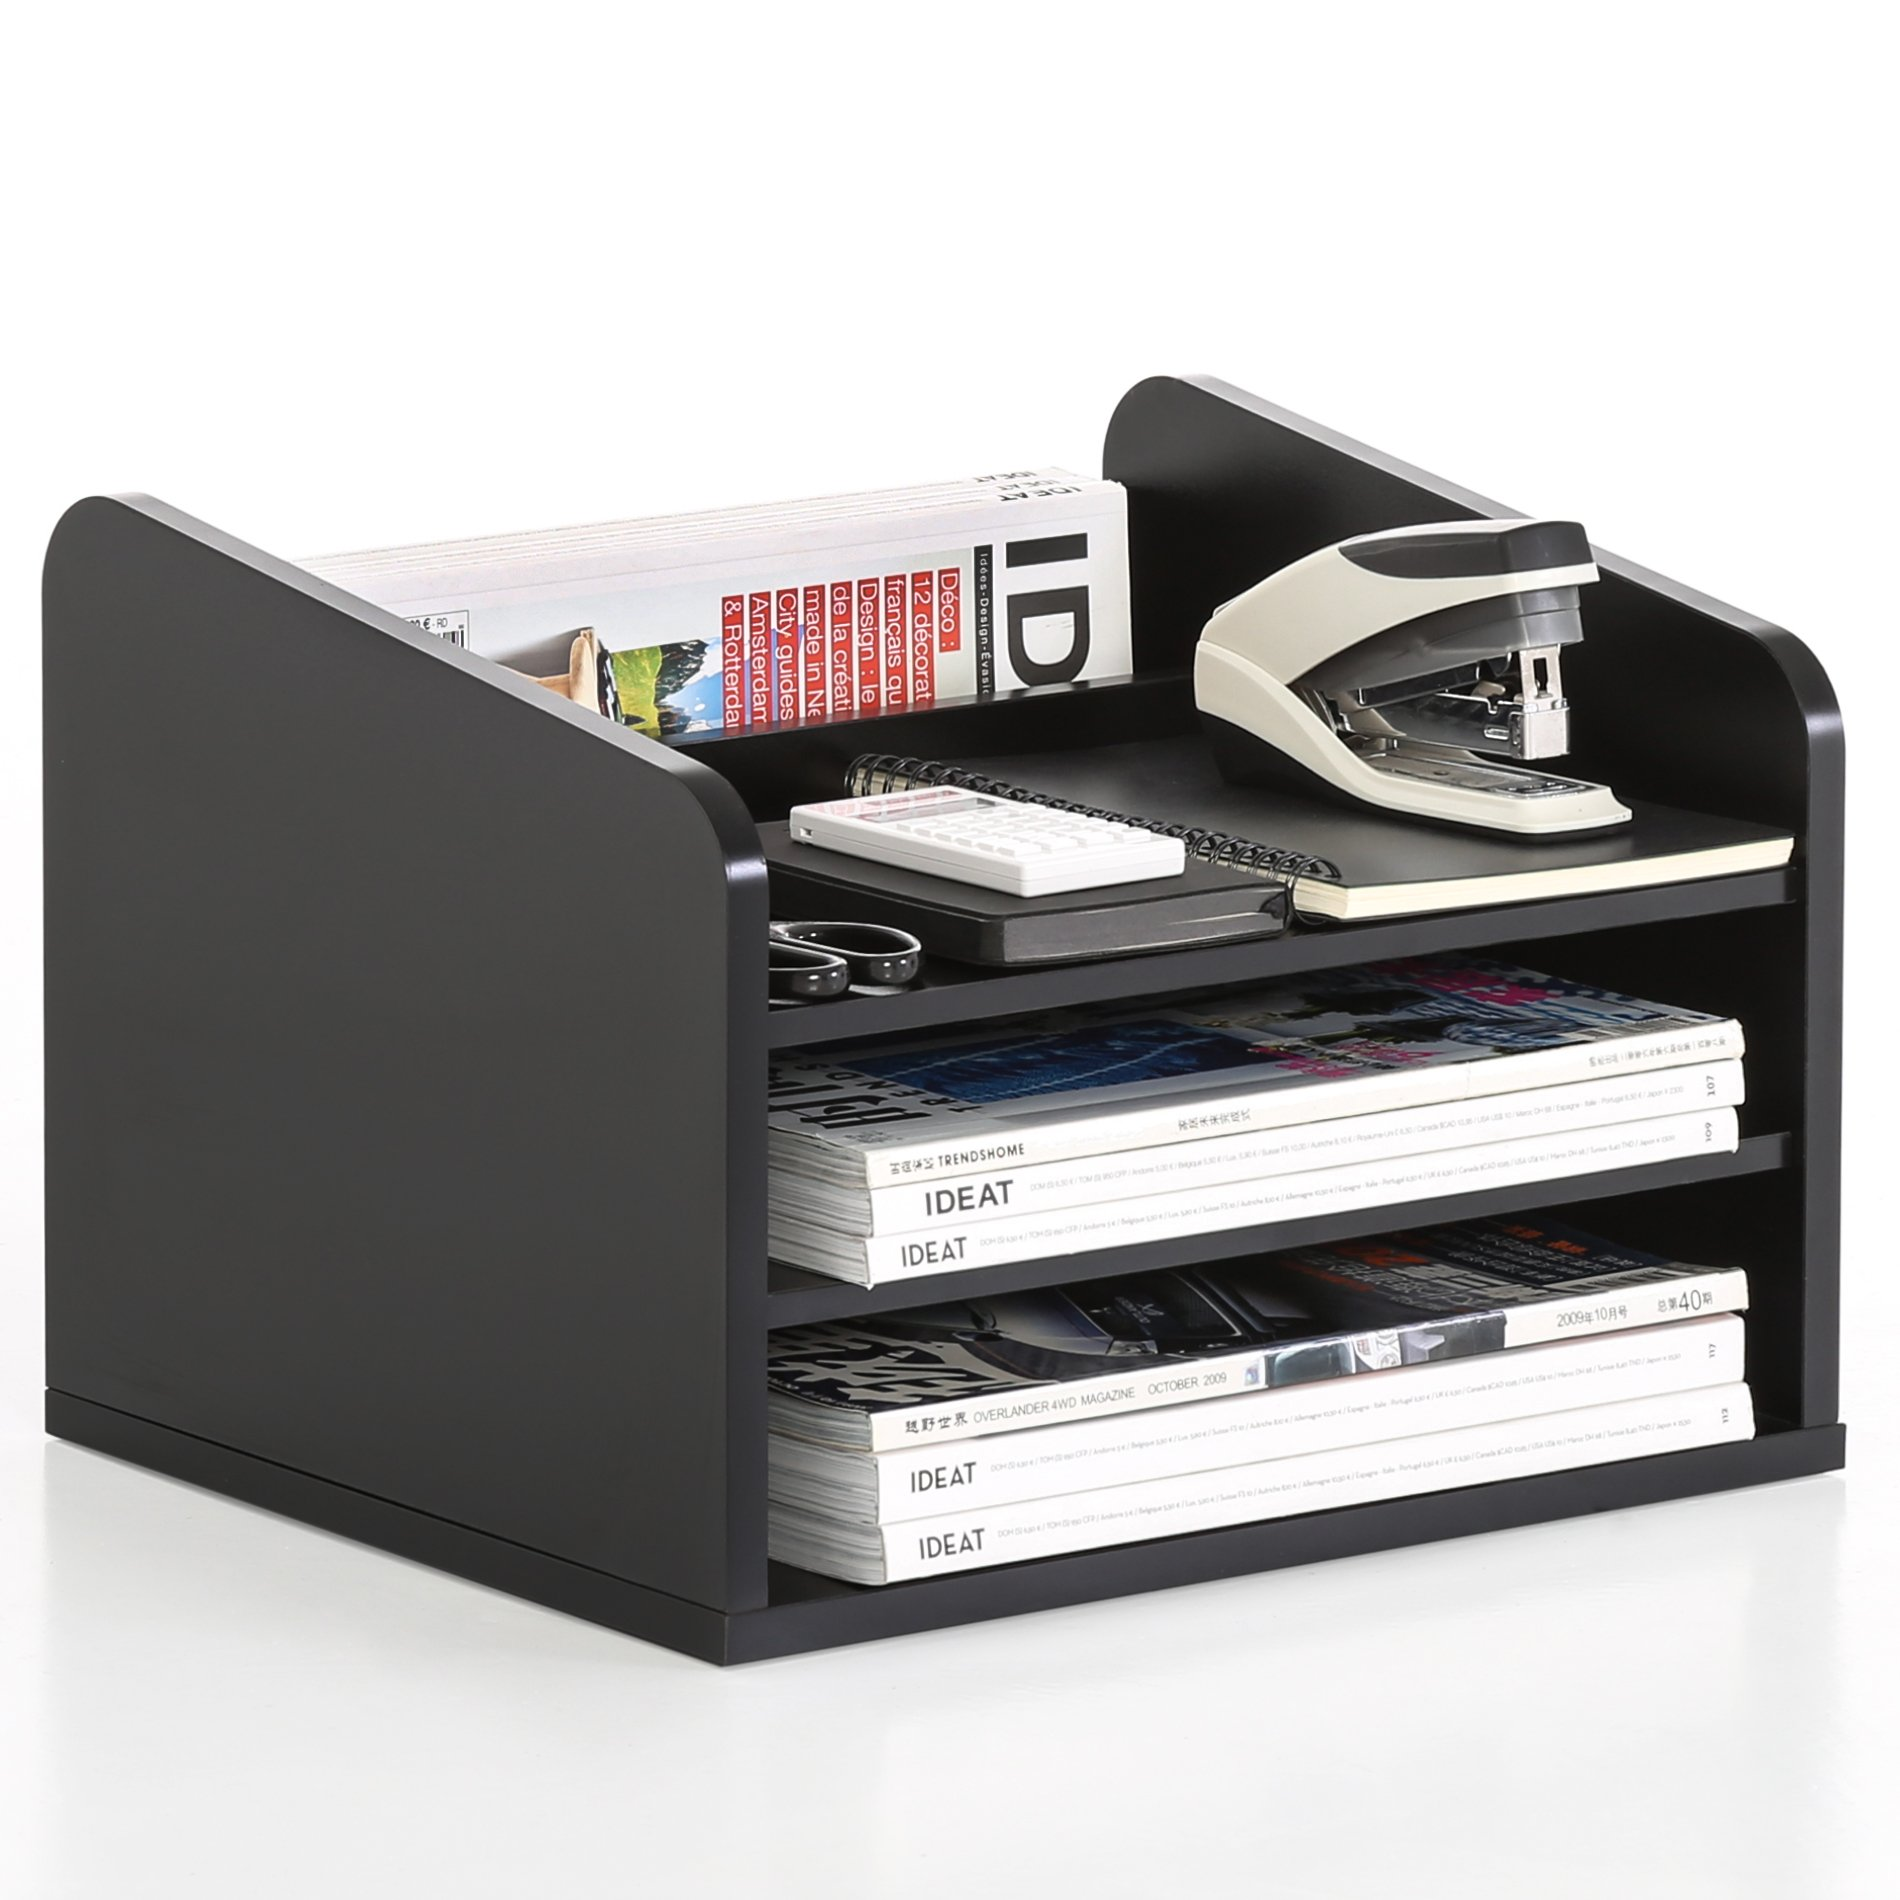 FITUEYES 3-Tier Wood Desk Organizer Workspace Organizers Black DO303501WB